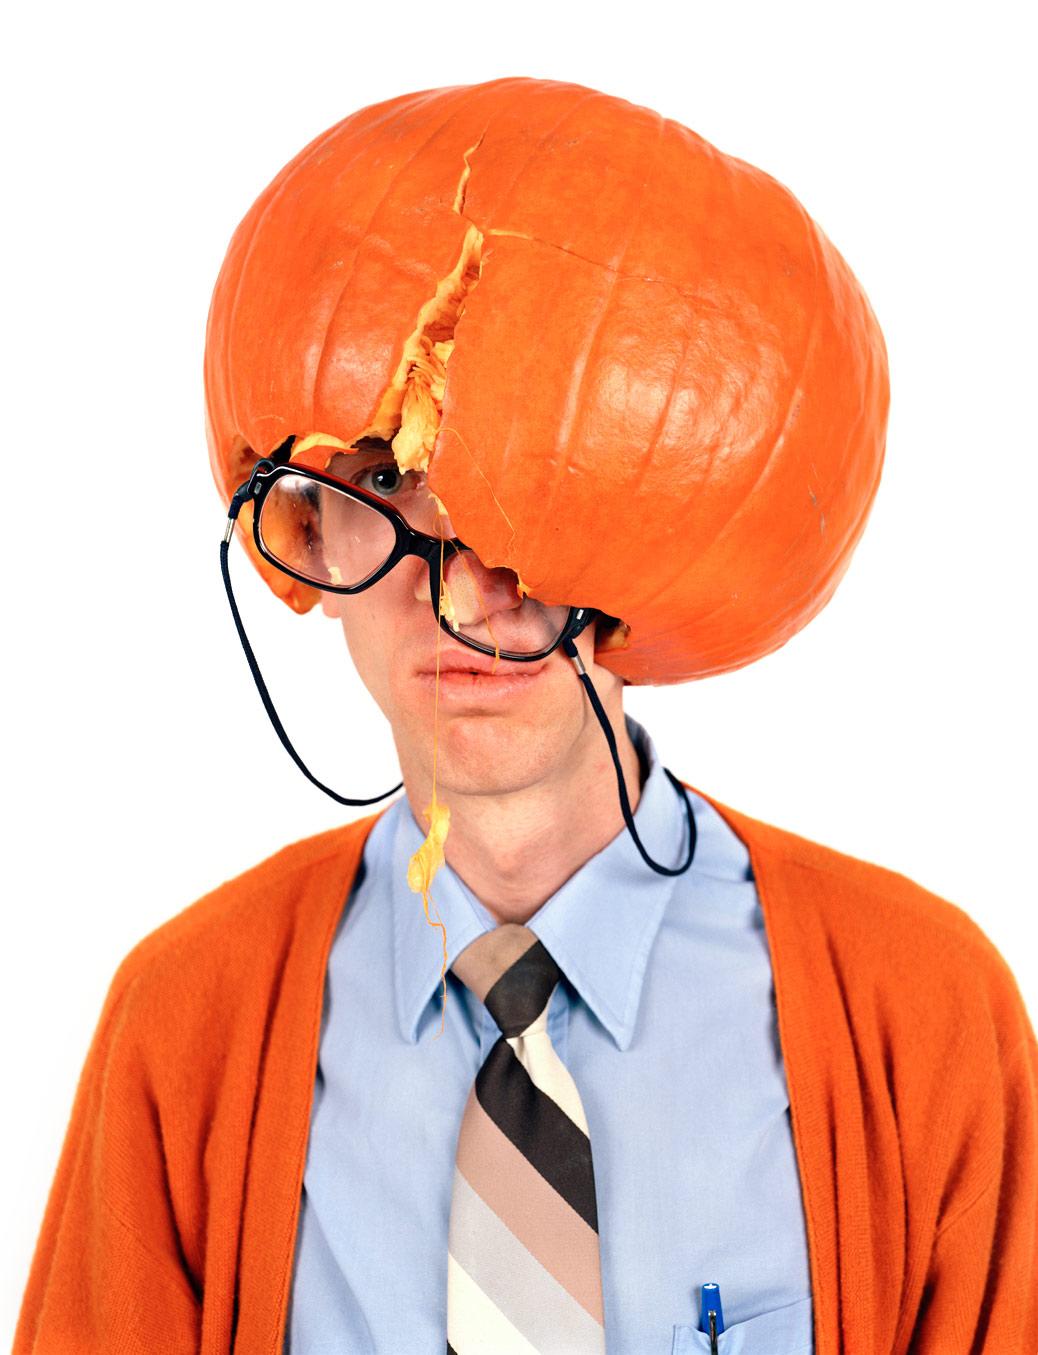 Untitled (pumpkin) 2006